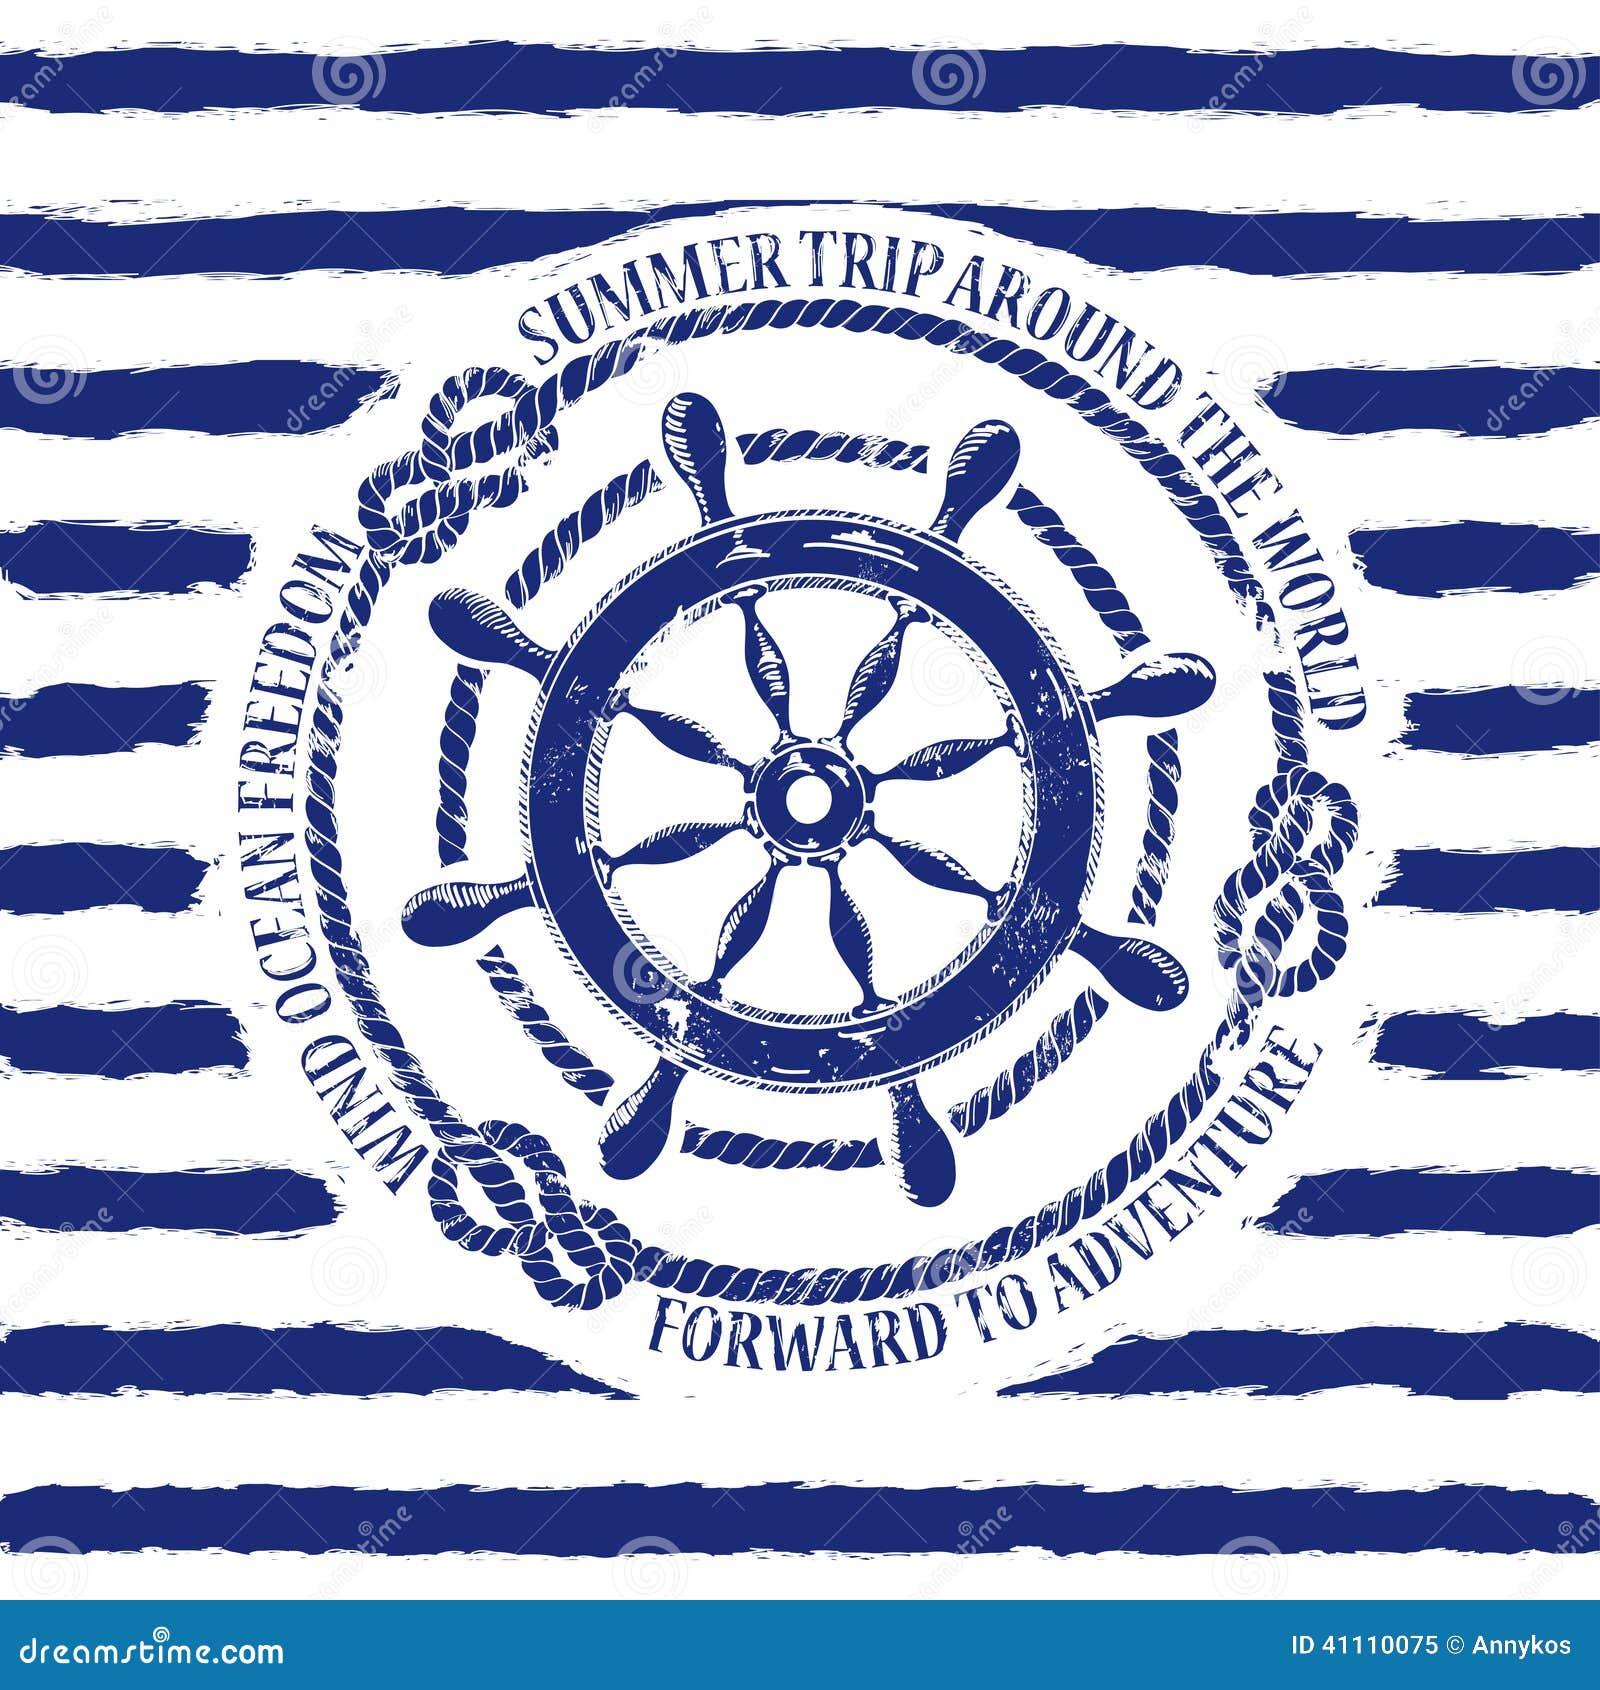 Nautical Emblem With Sea Wheel Stock Vector - Image: 41110075